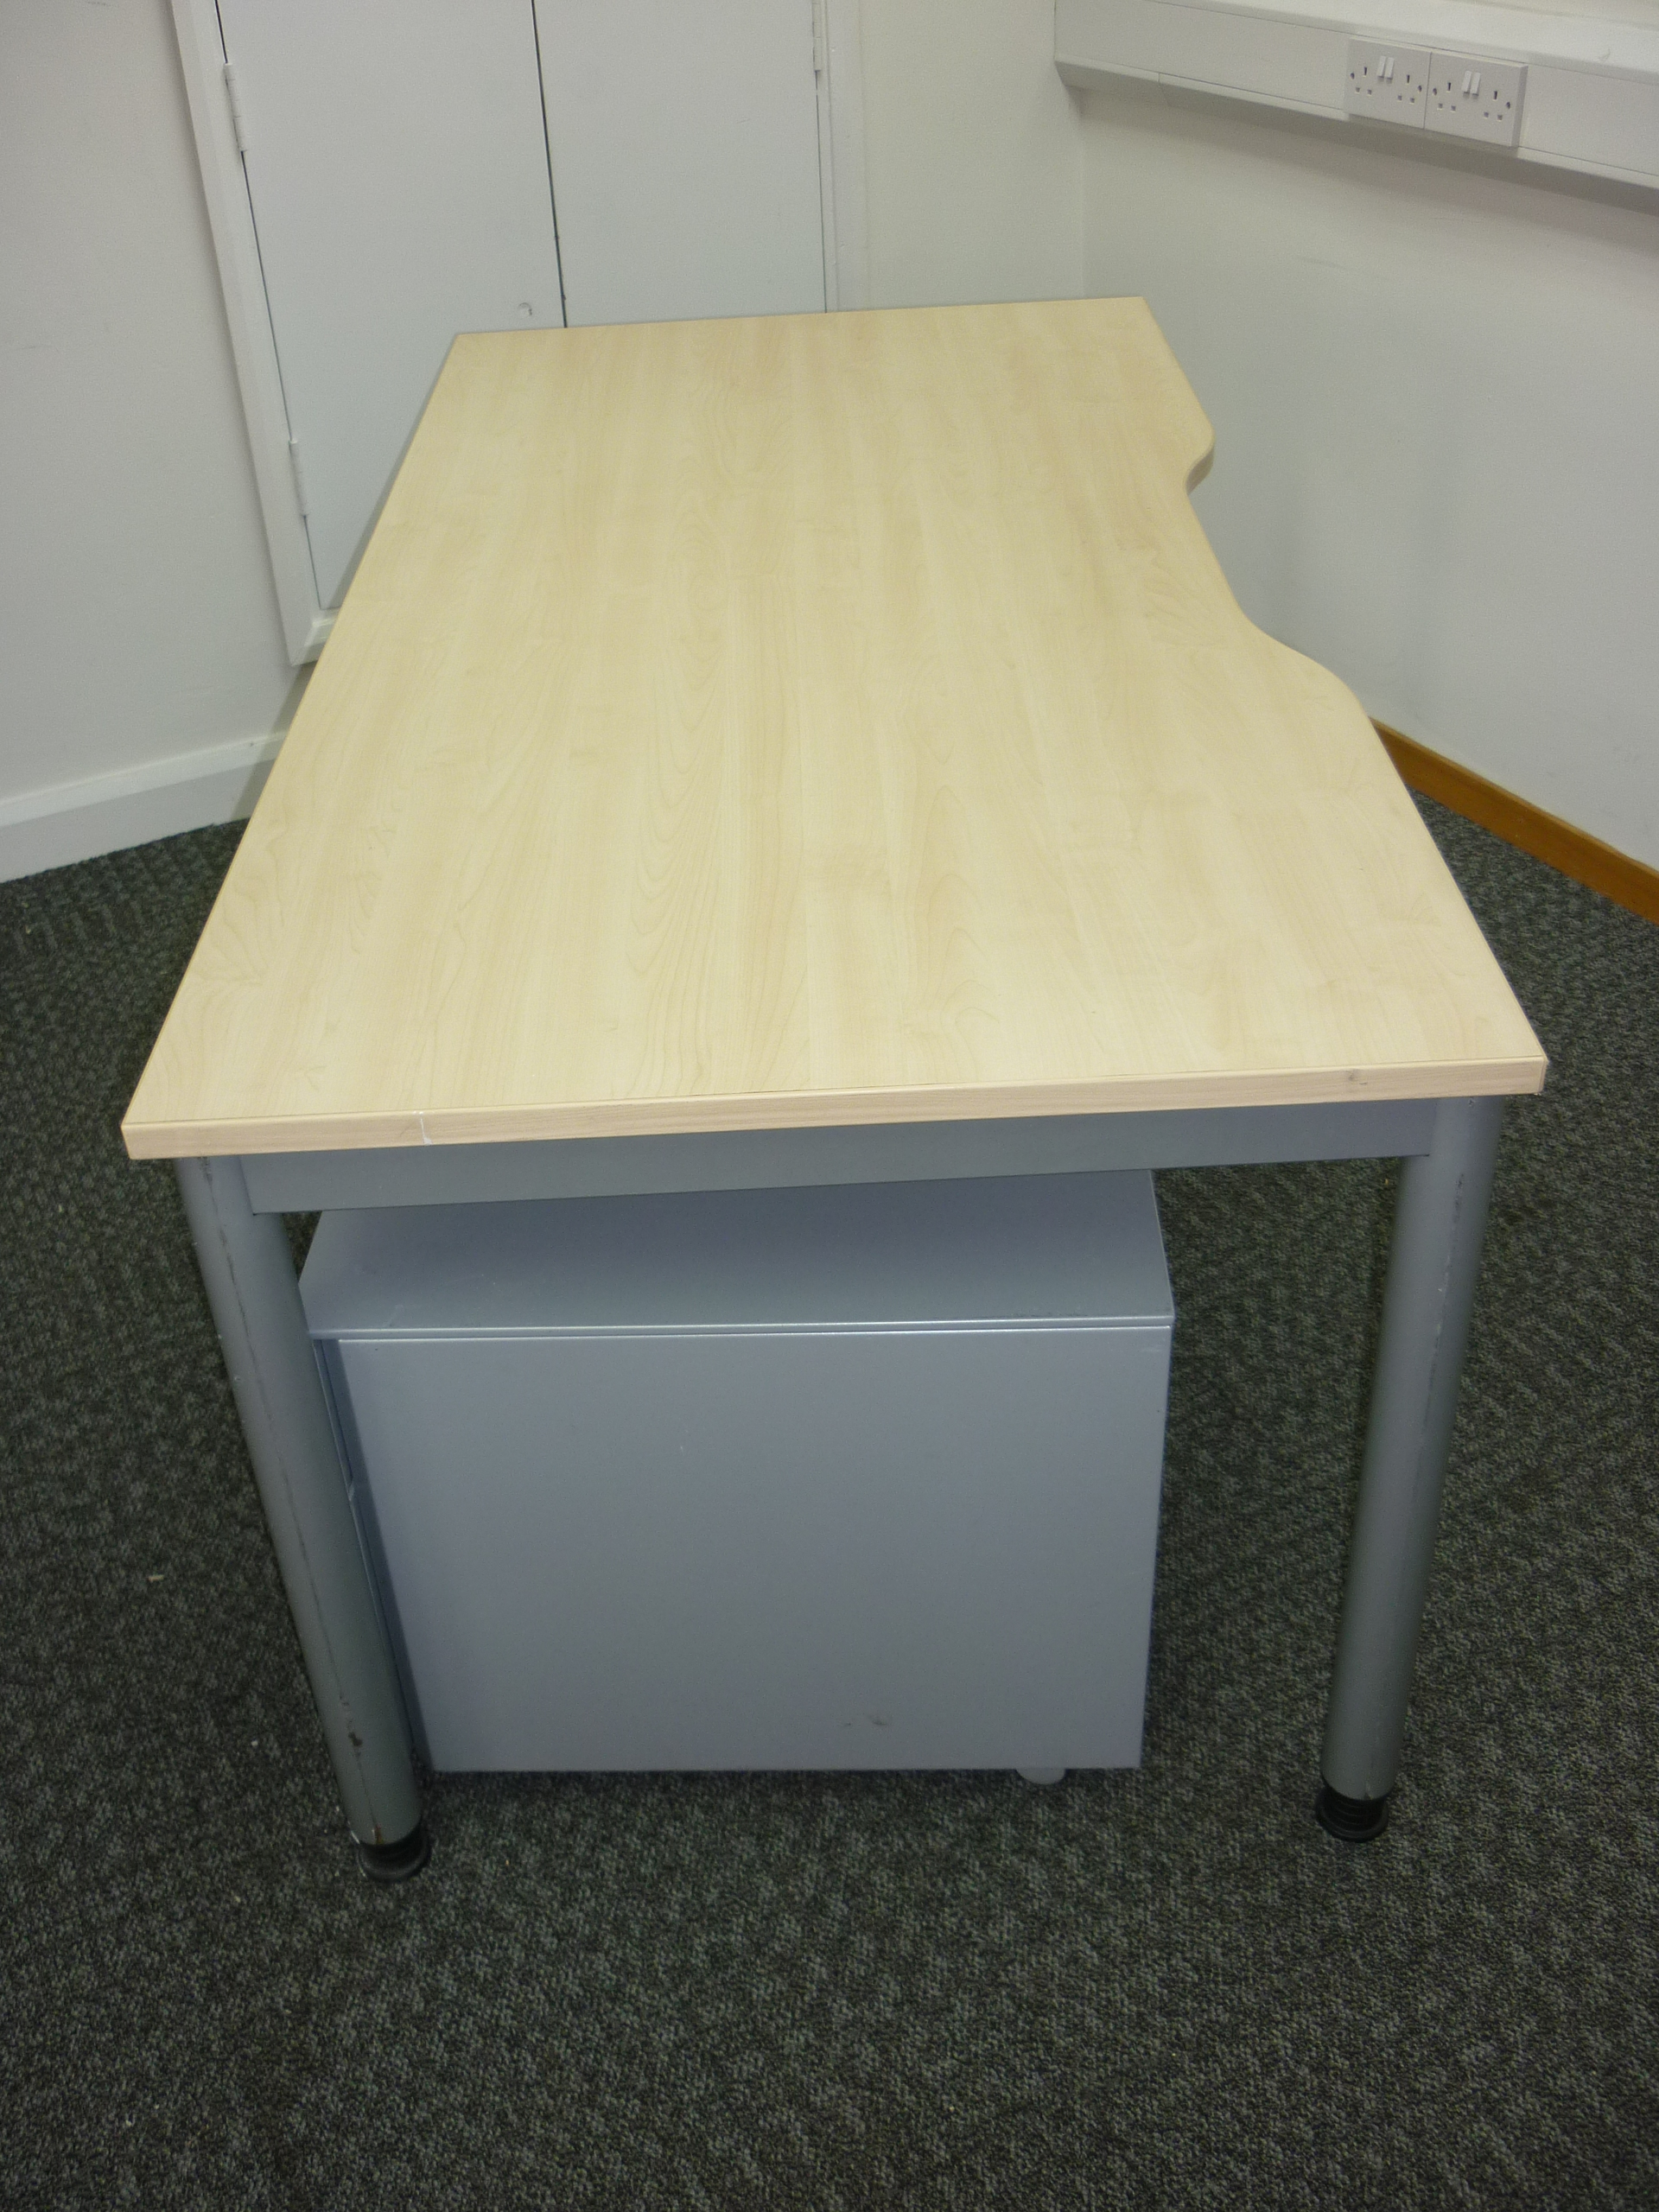 Steelcase maple rectangular 1600w x 800d mm desk